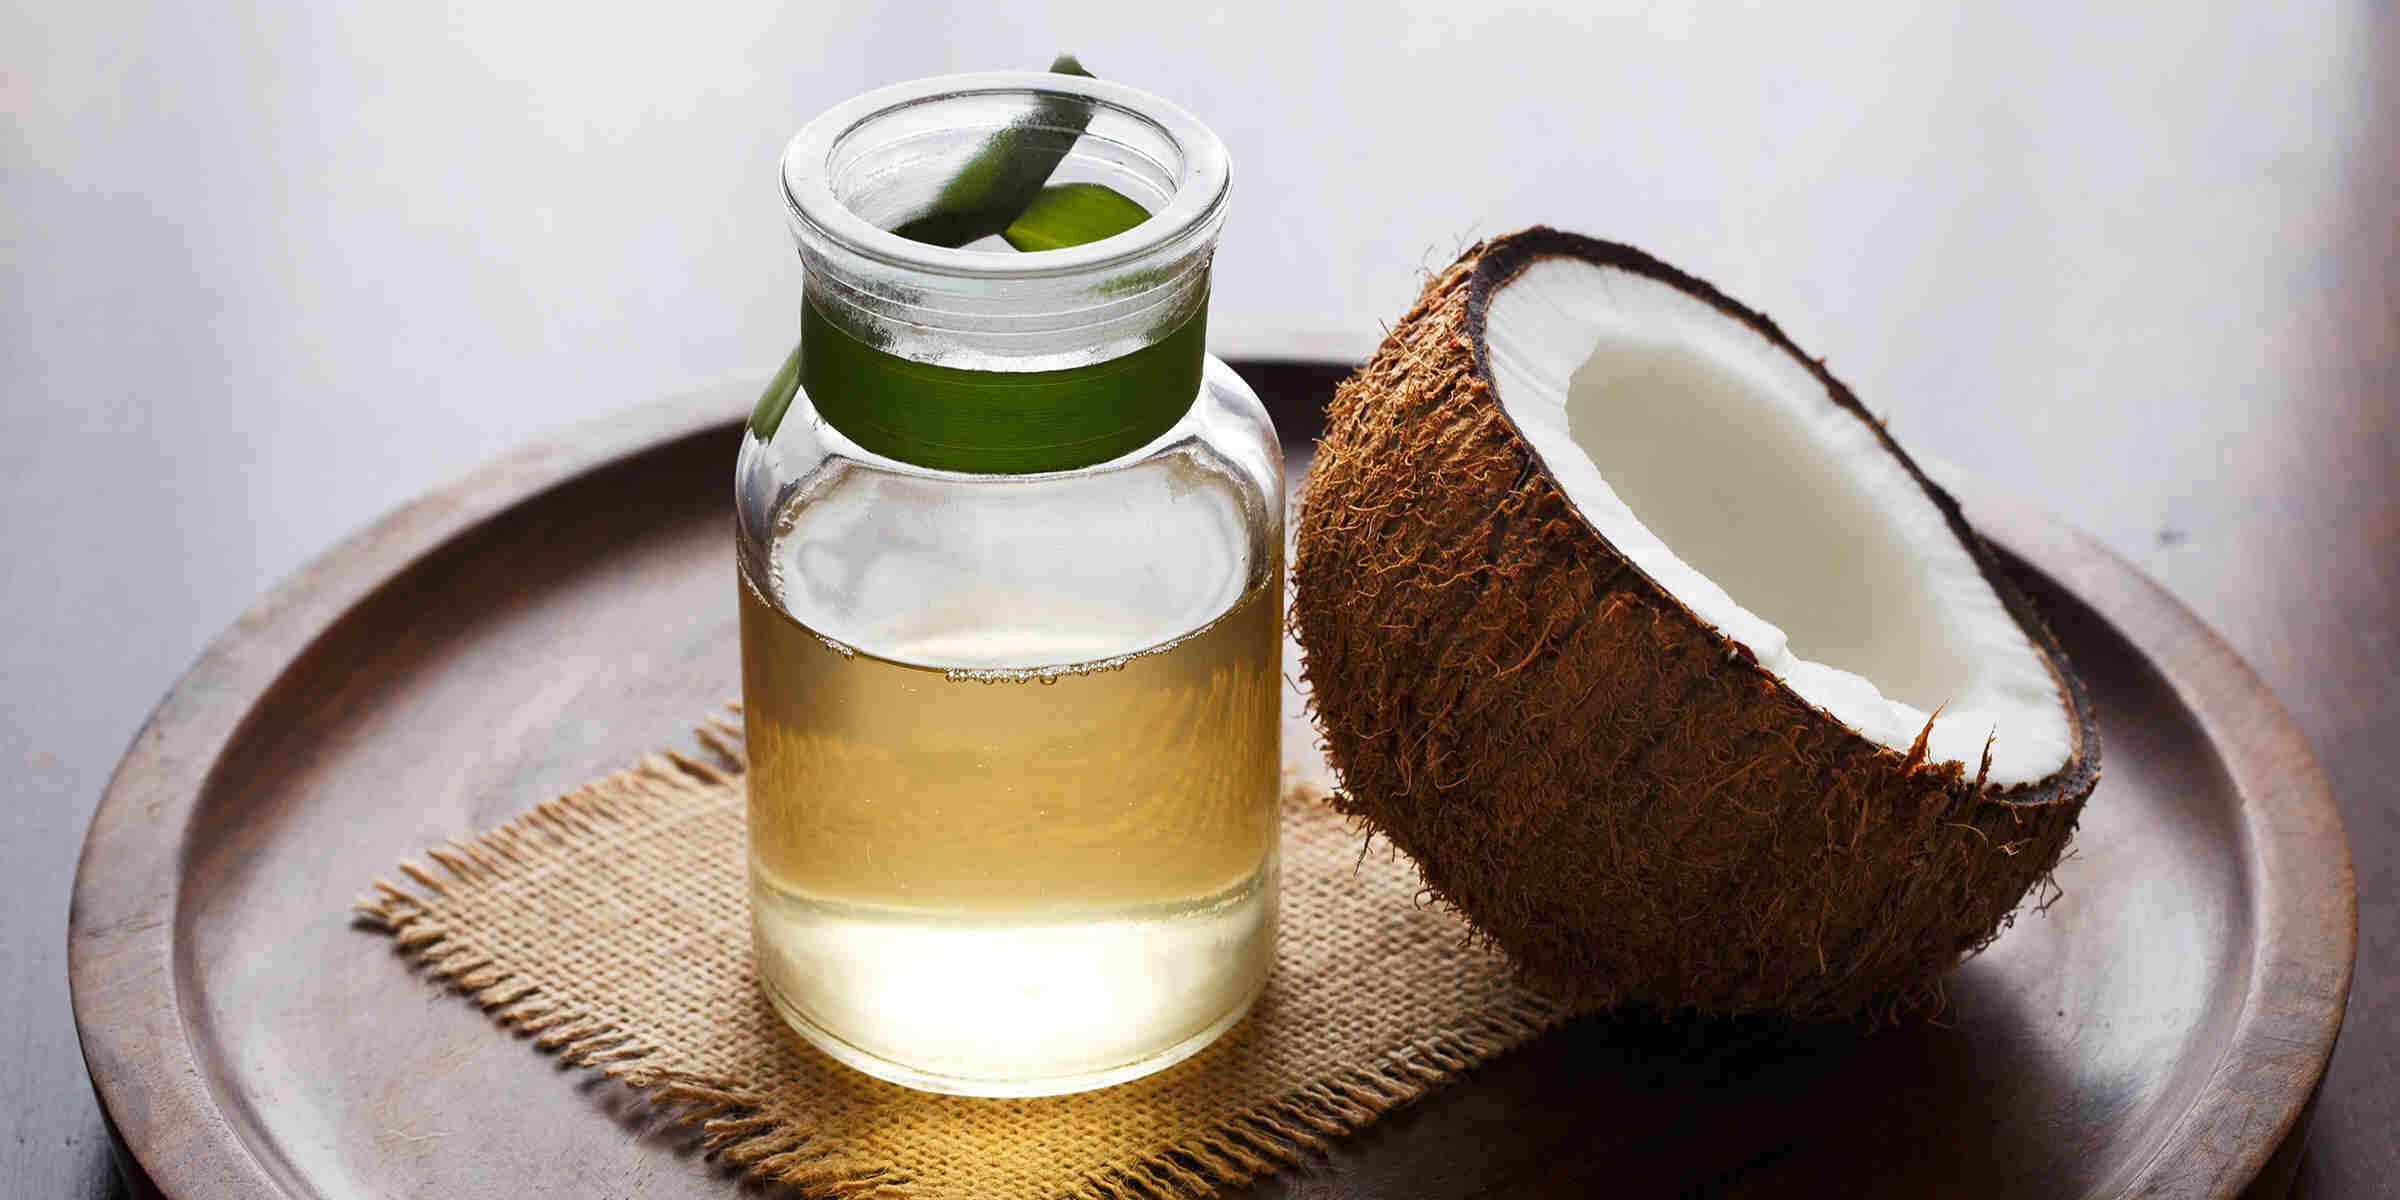 Best Oil For Hair Growth Coconut Oil